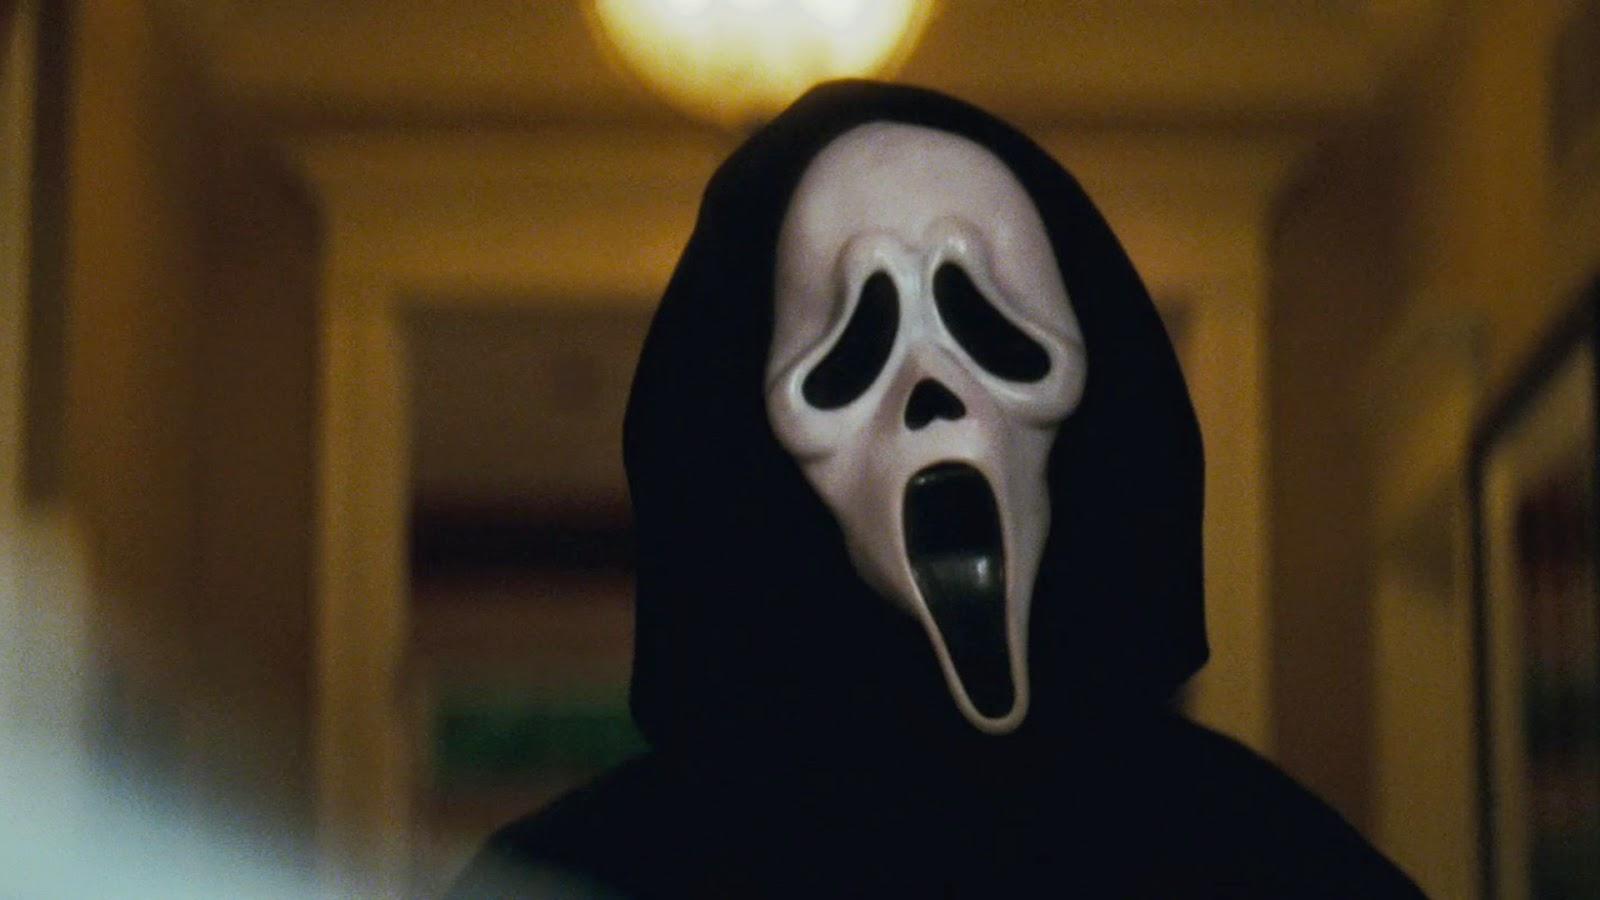 Nº1 Sobre Español 5 Scream En Spain Blog QdshrBtCx